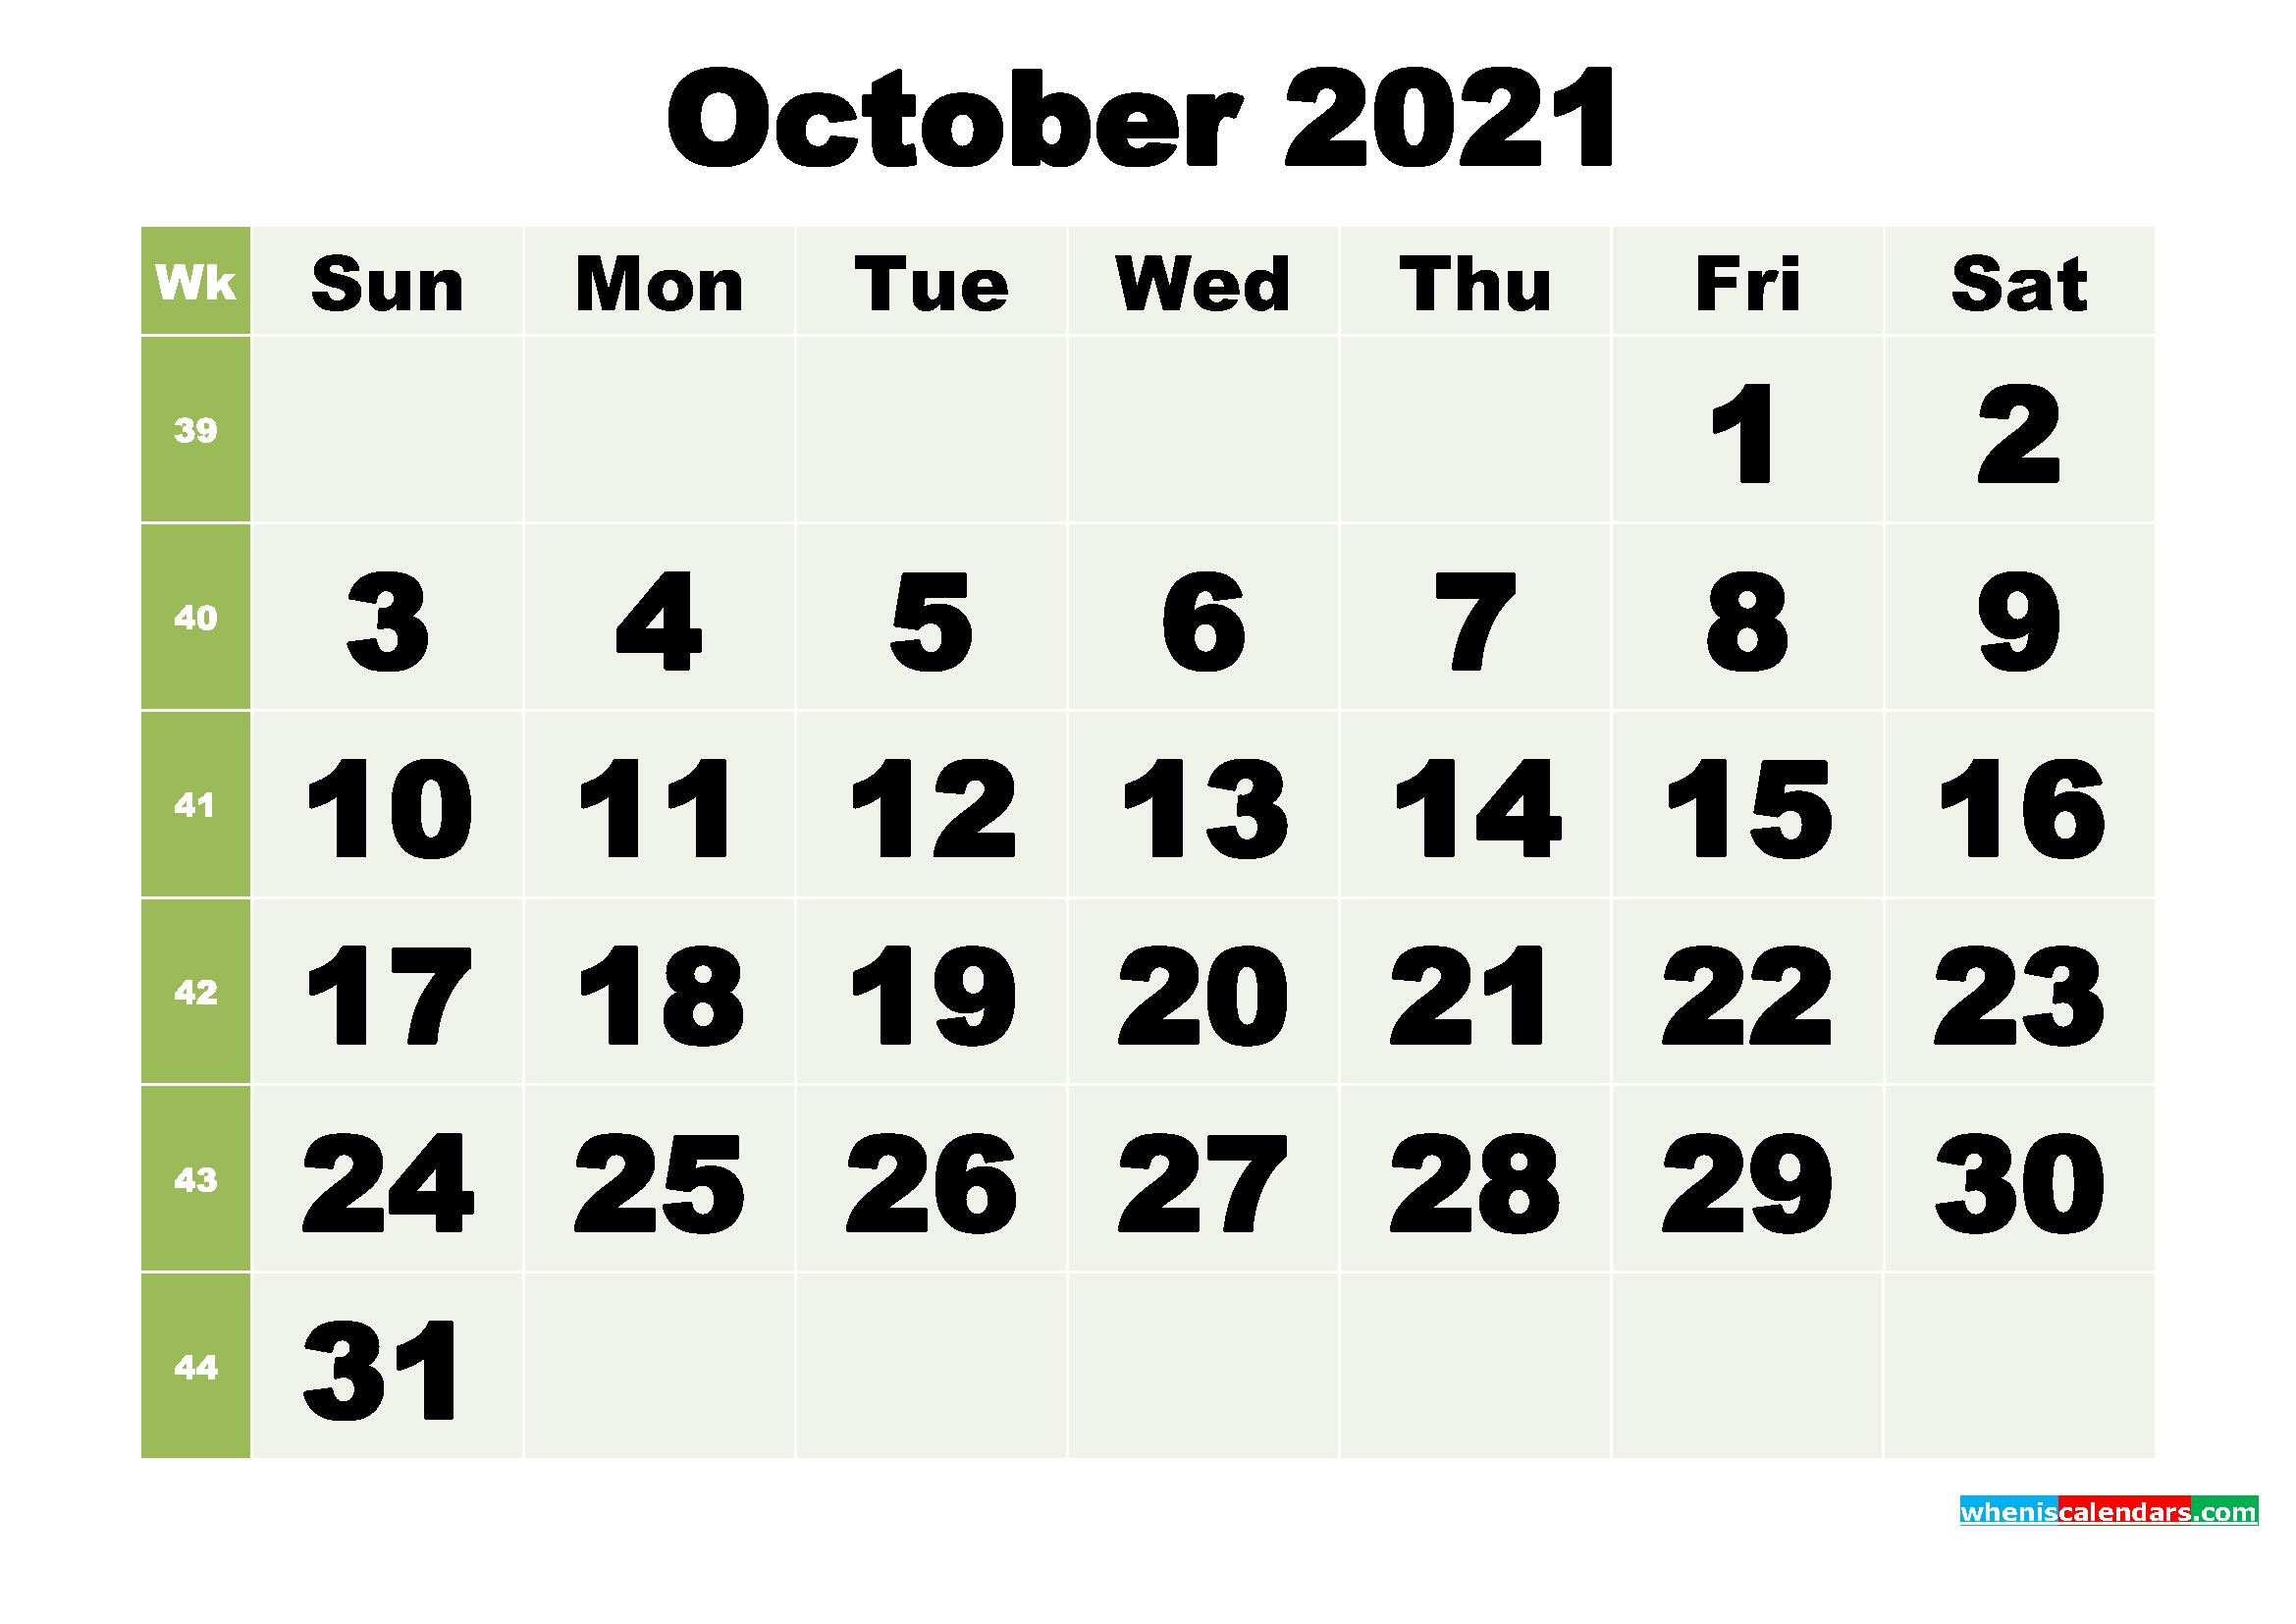 October 2021 Printable Calendar Template – Free Printable 2020 Monthly Calendar With Holidays-Monthly Calendar Printable October 2021